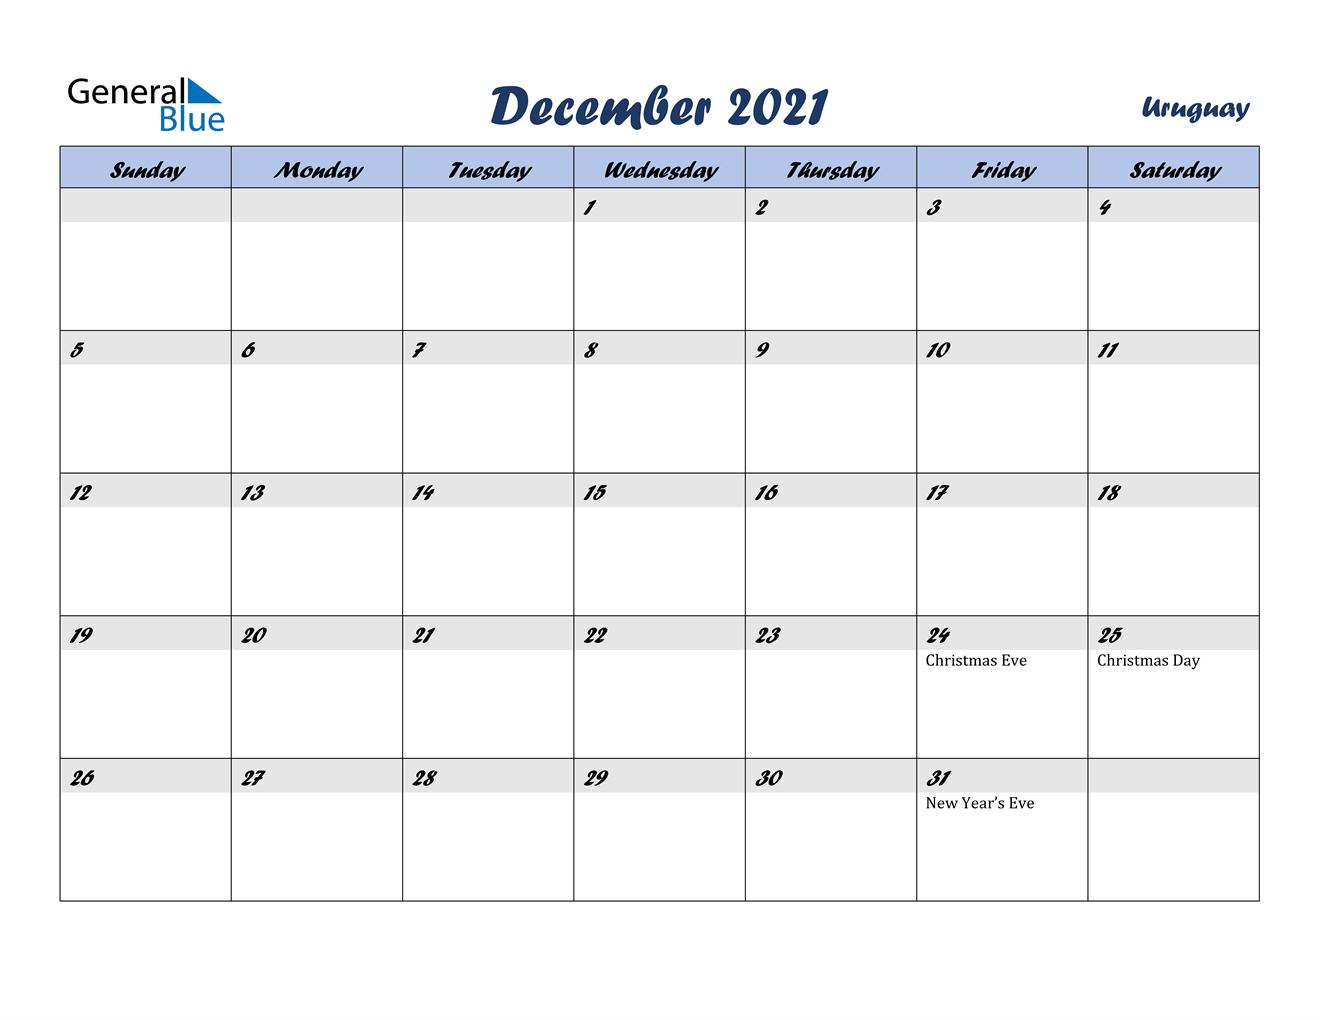 December 2021 Calendar - Uruguay